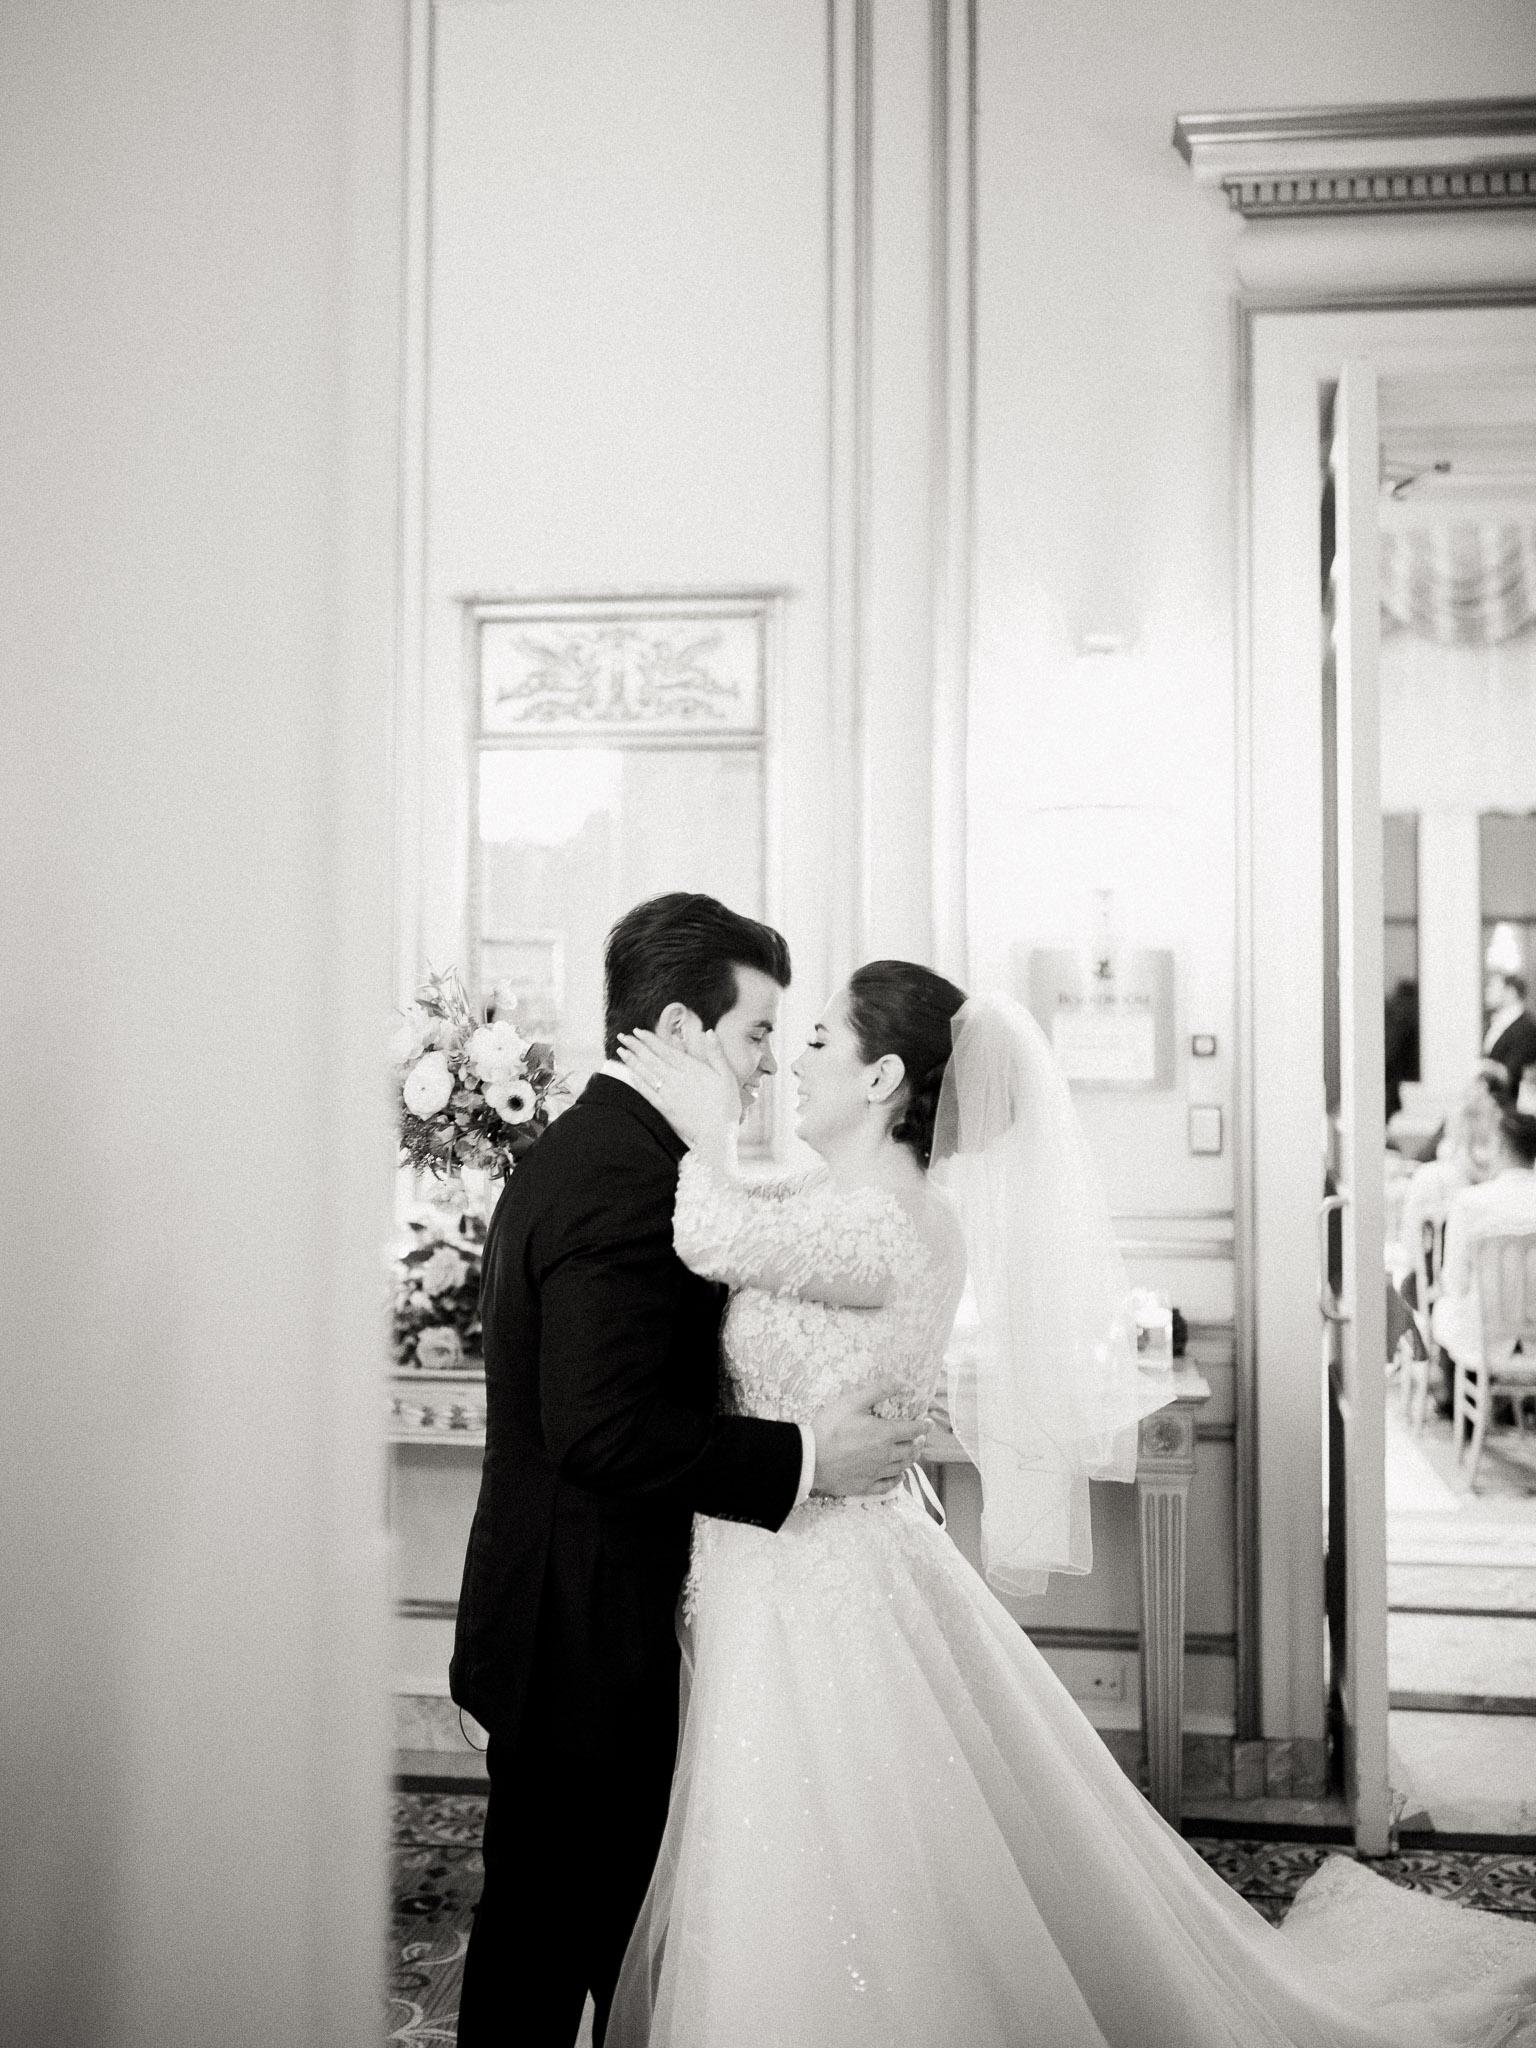 Hanna&Jordan Wedding_HotelVancouver_9377.jpg